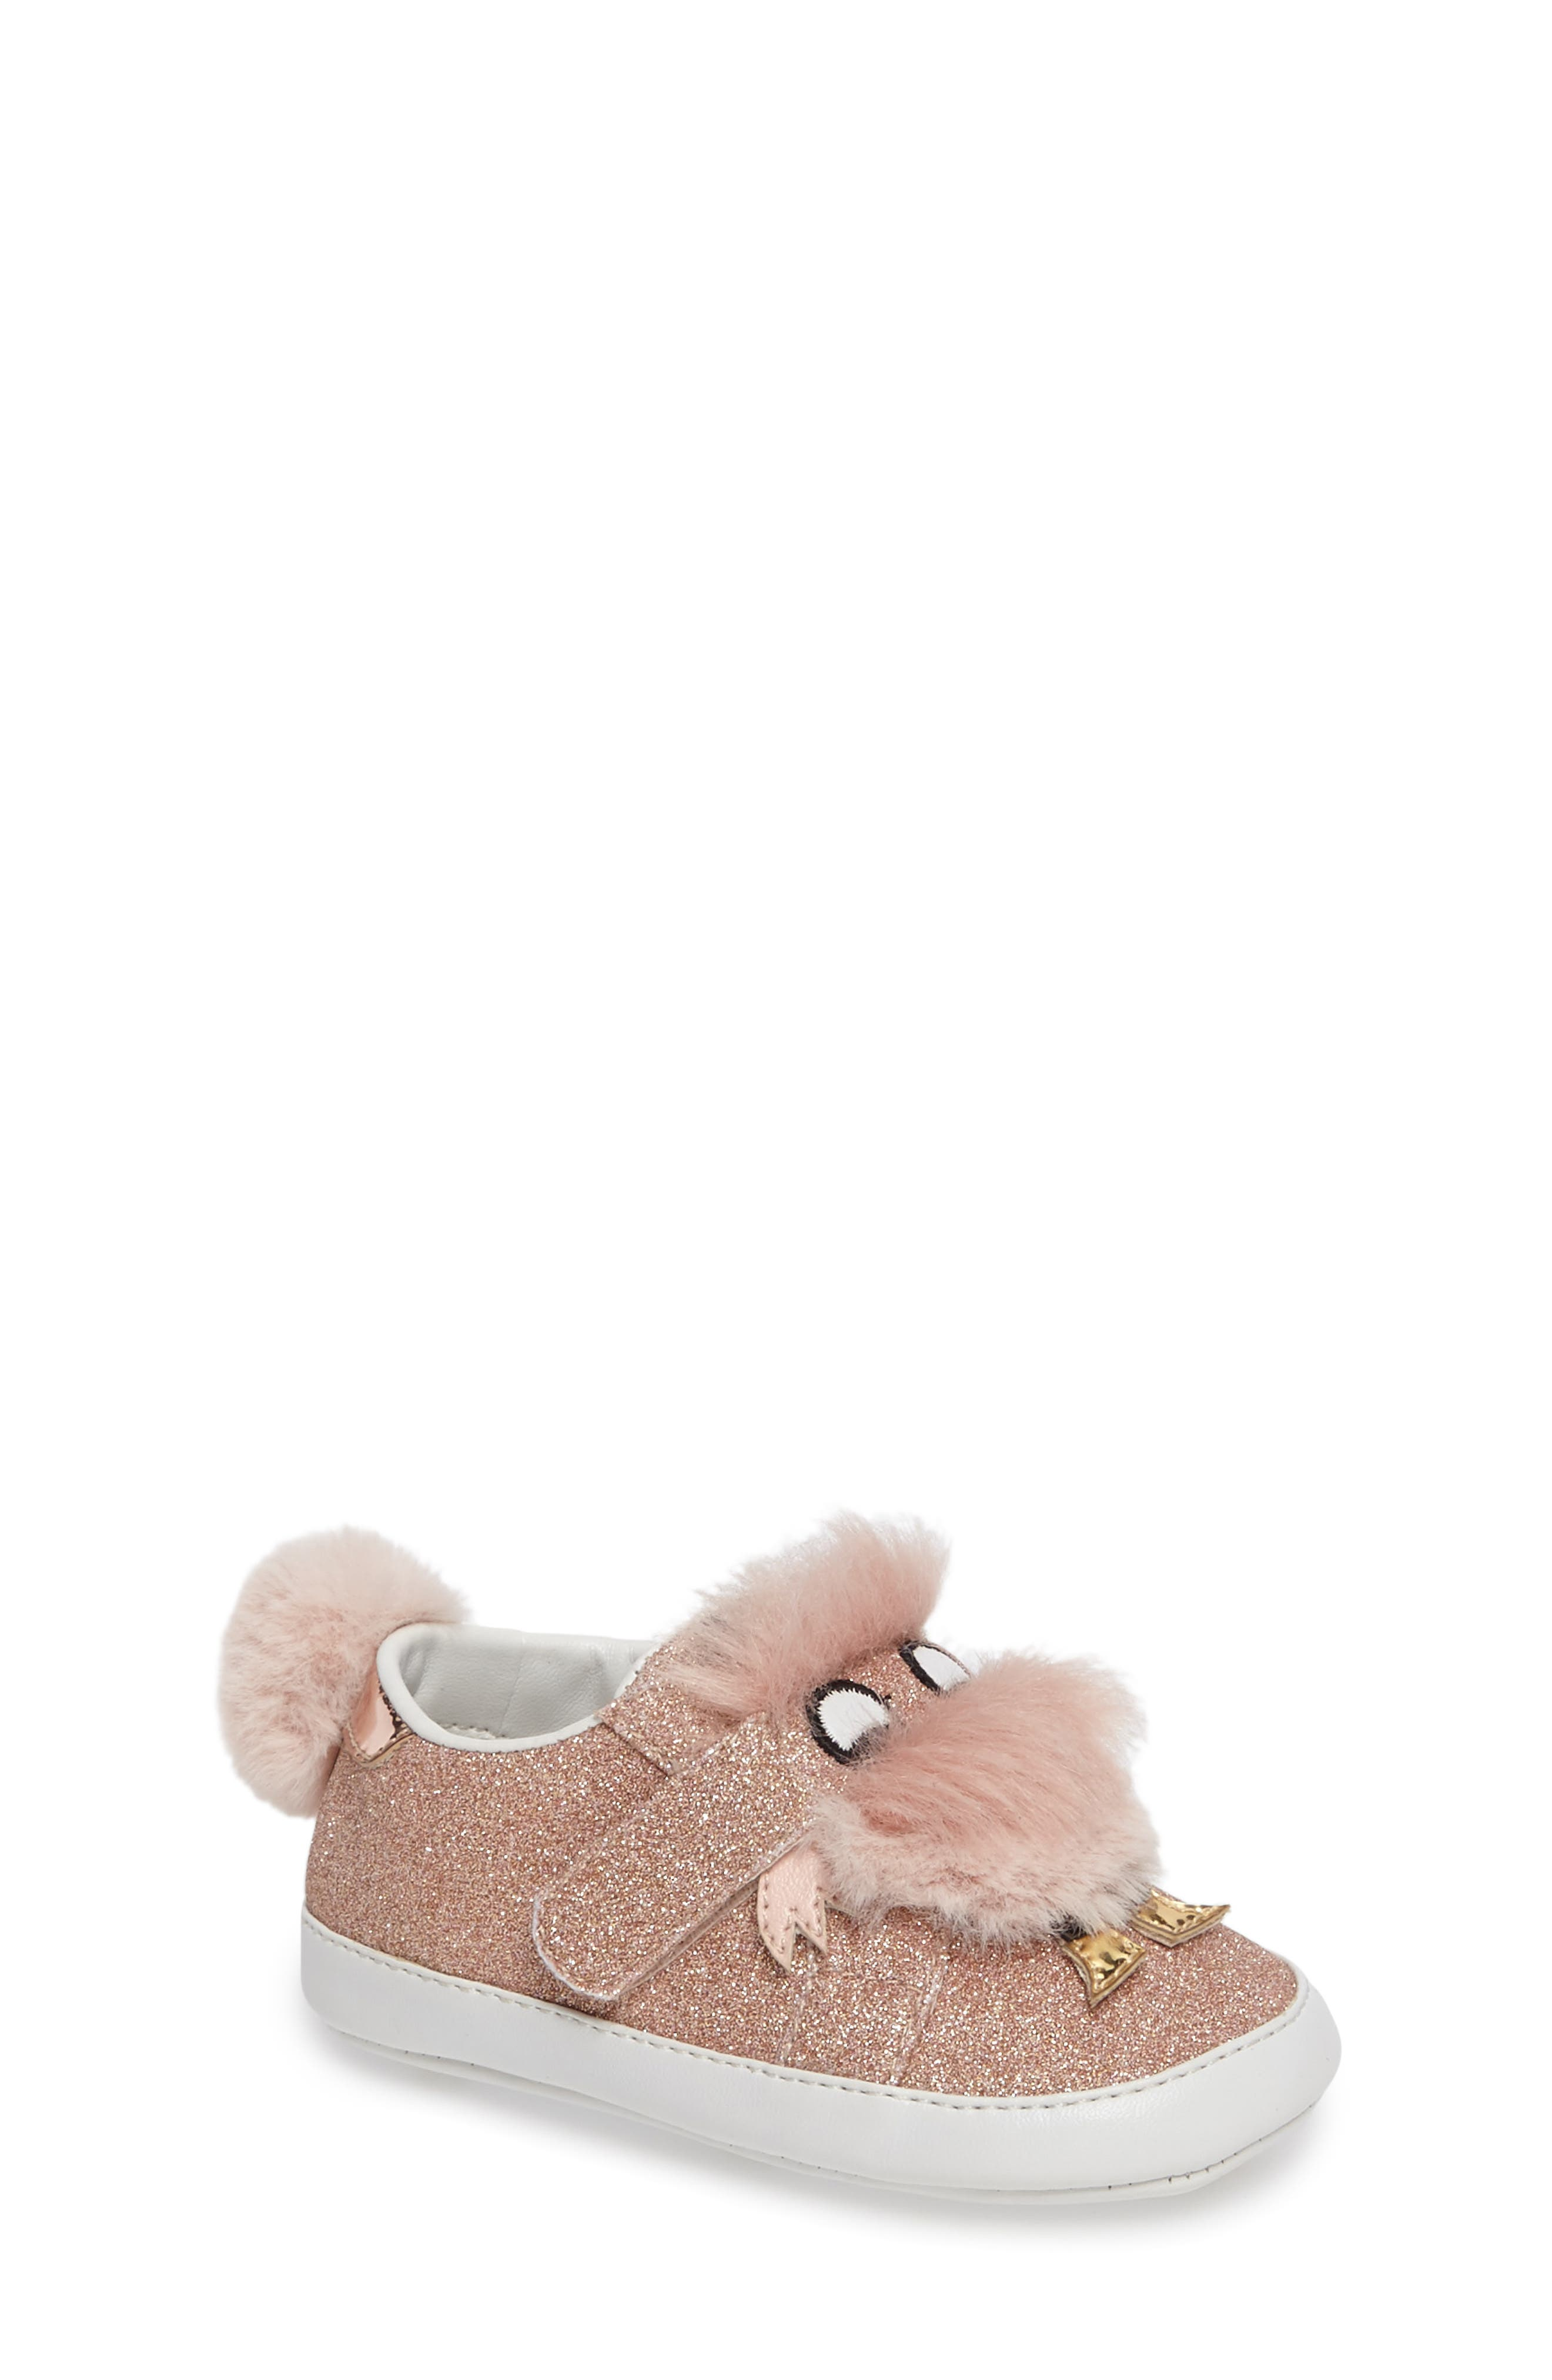 Main Image - Sam Edelman Ovee Sneaker (Baby)